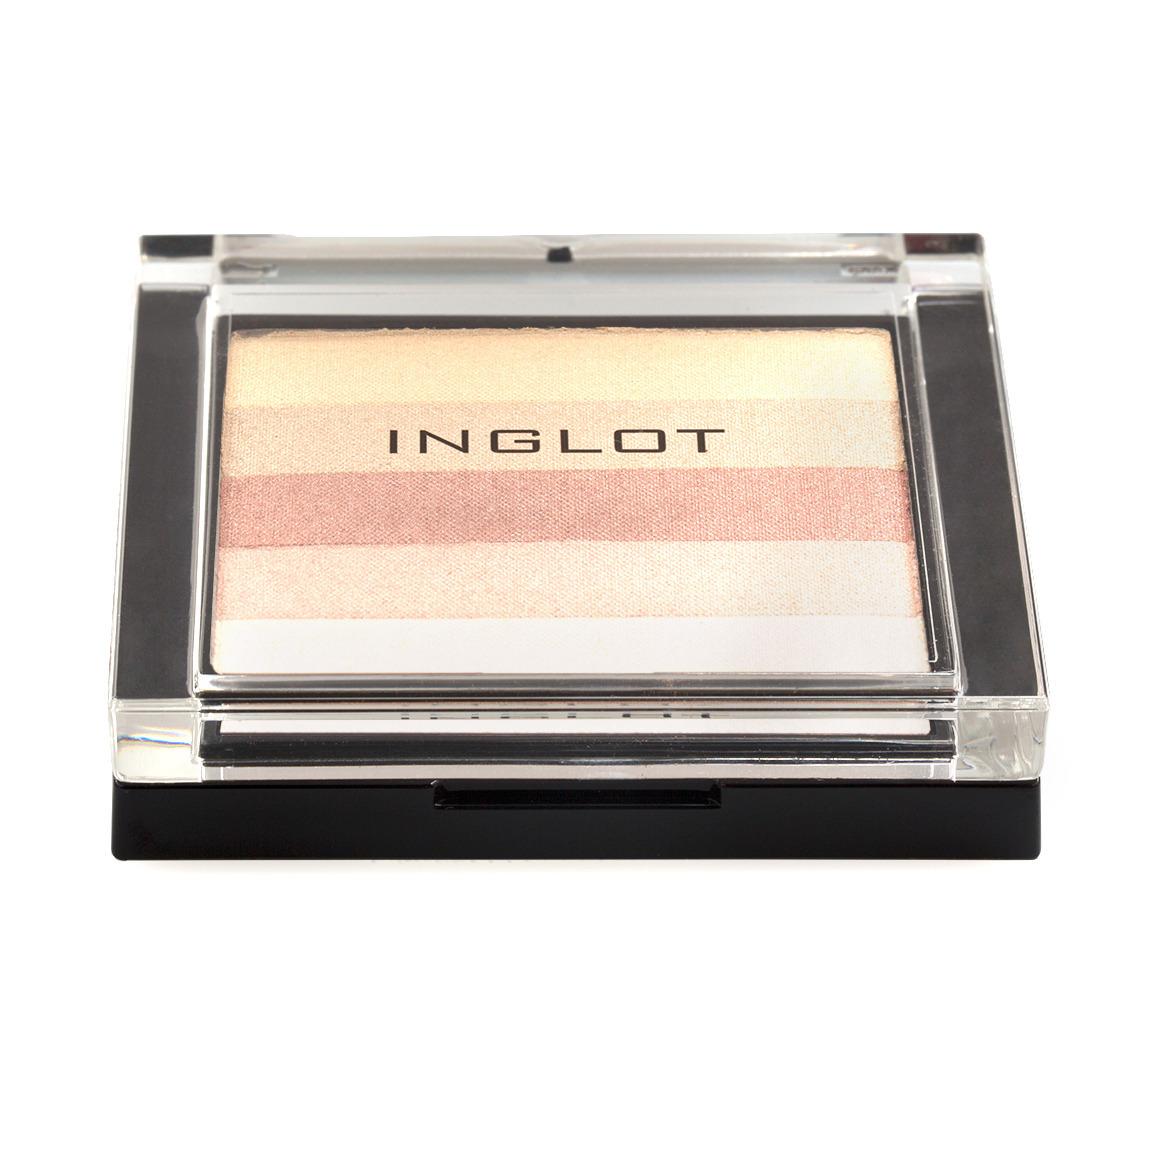 Inglot Cosmetics AMC Multicolour Highlighting Powder 84 alternative view 1.